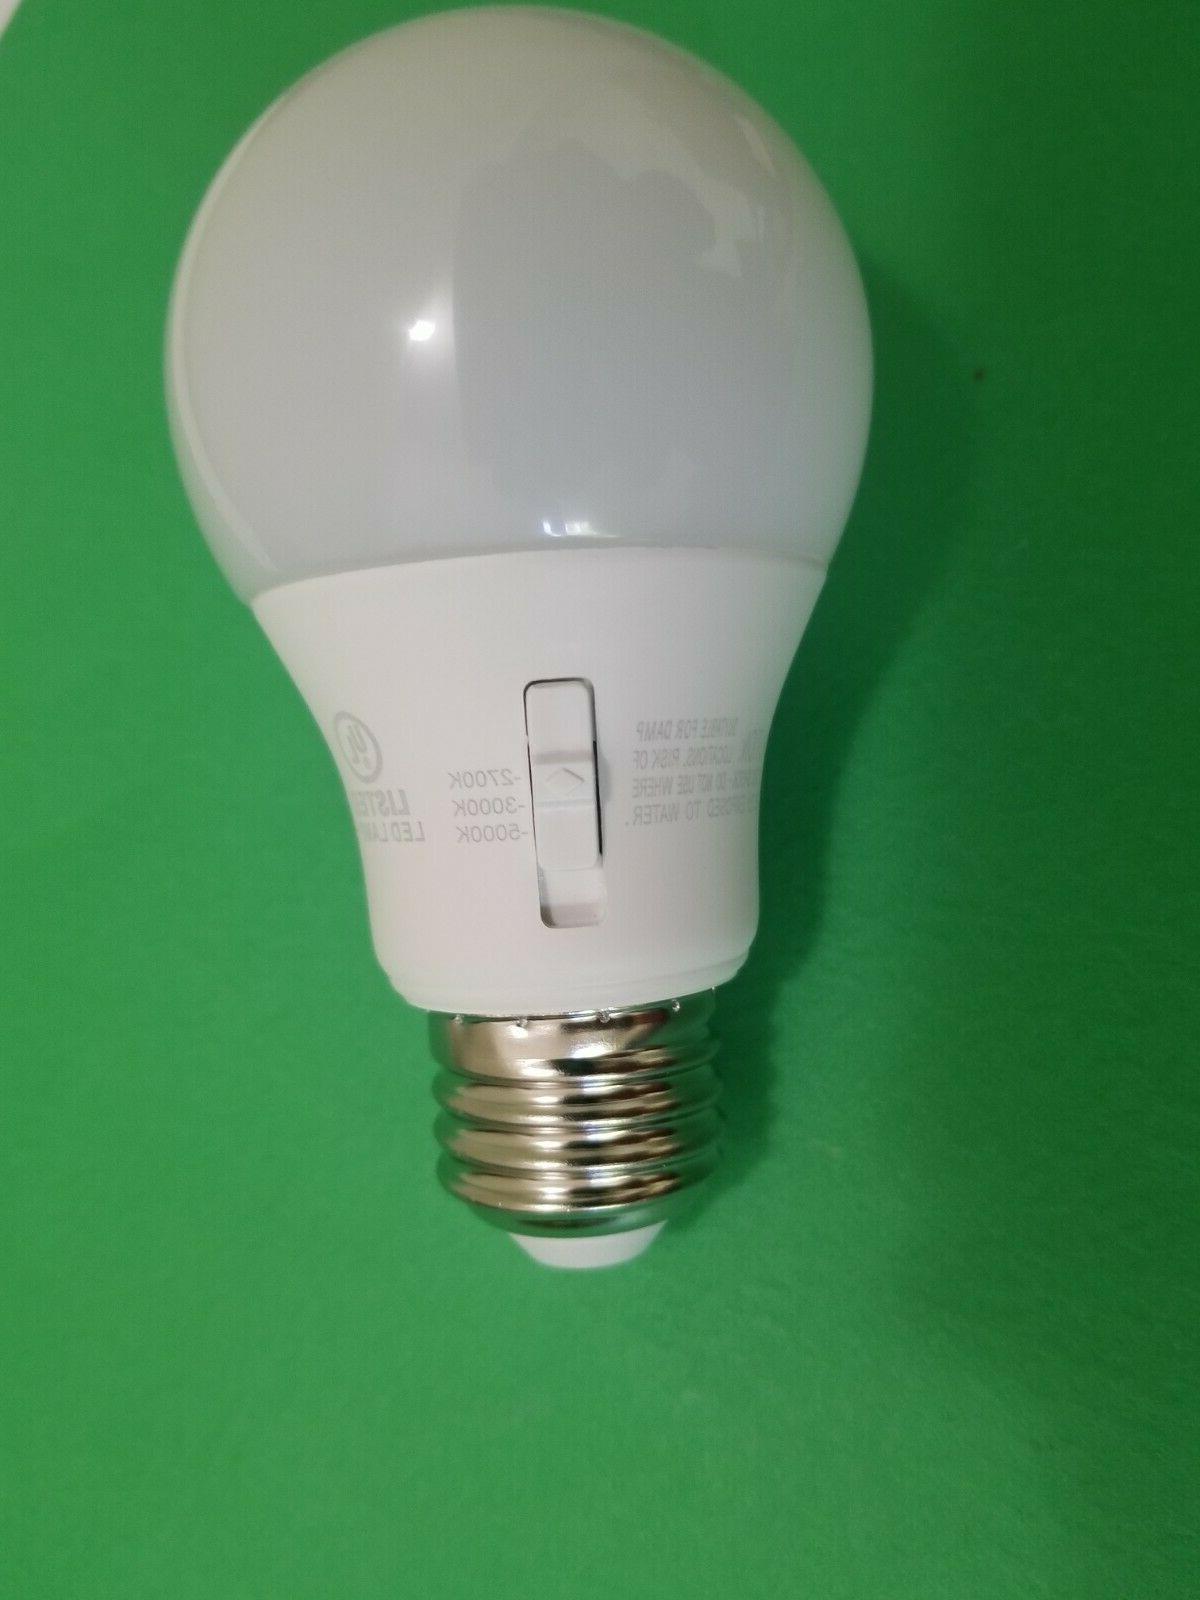 Led Daylight Bulb: QTY4 Adjustable 60-watt-ecosmart-A19-dimmable-energy Star